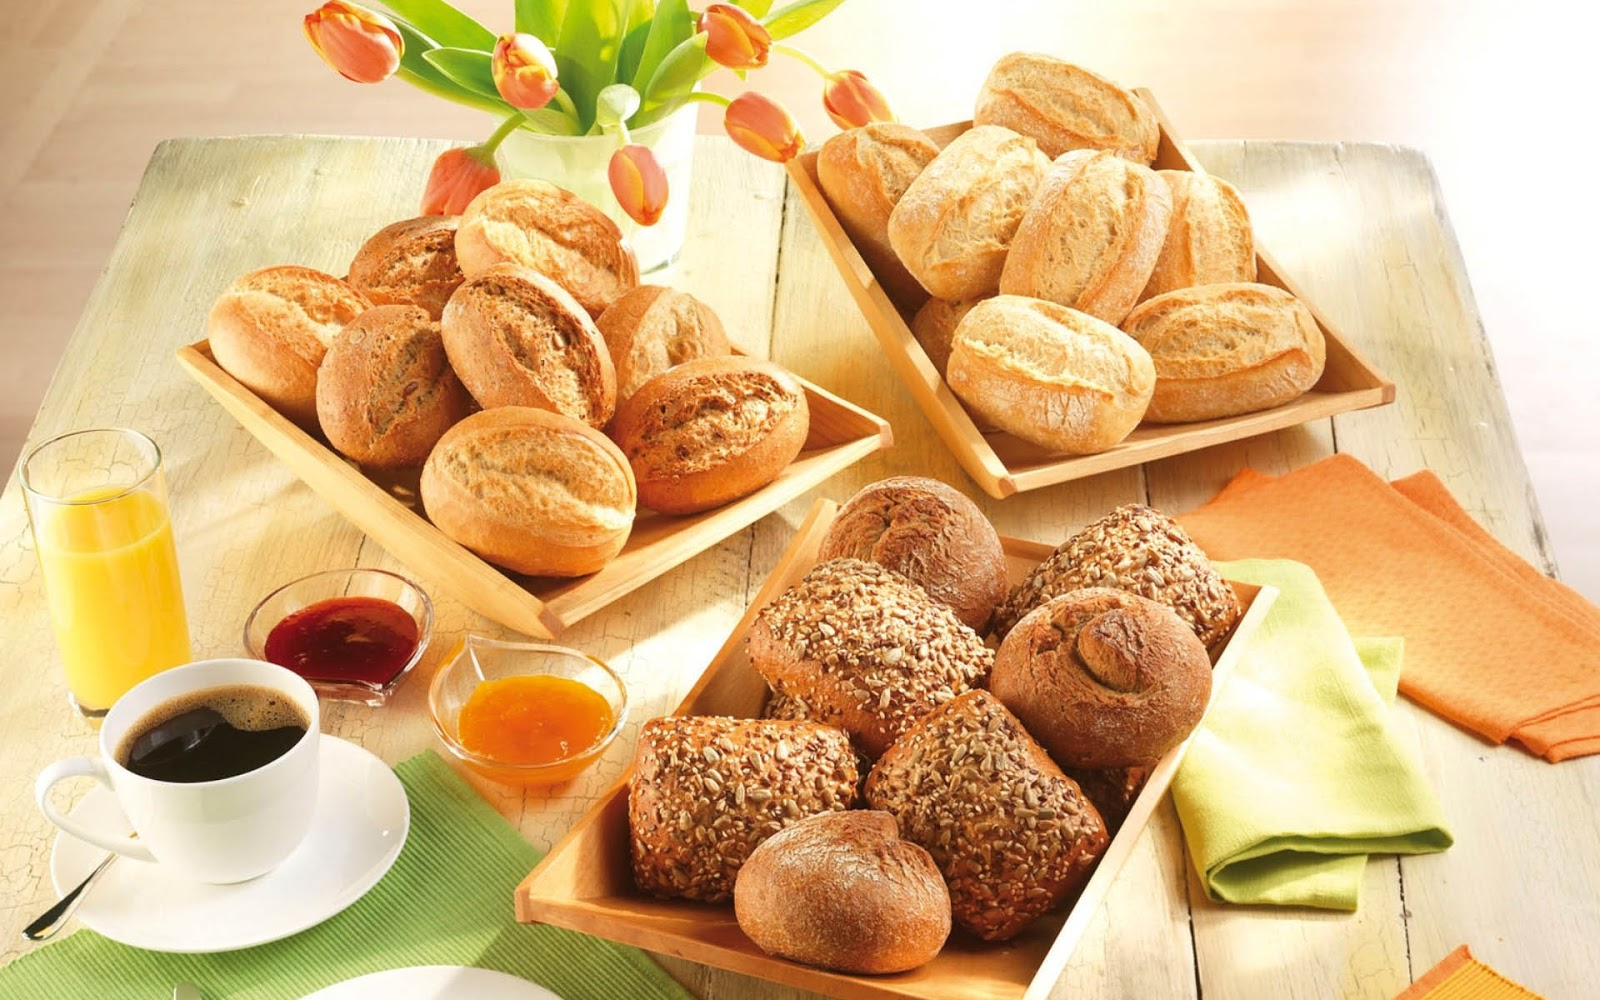 eiwitshake als ontbijt afvallen